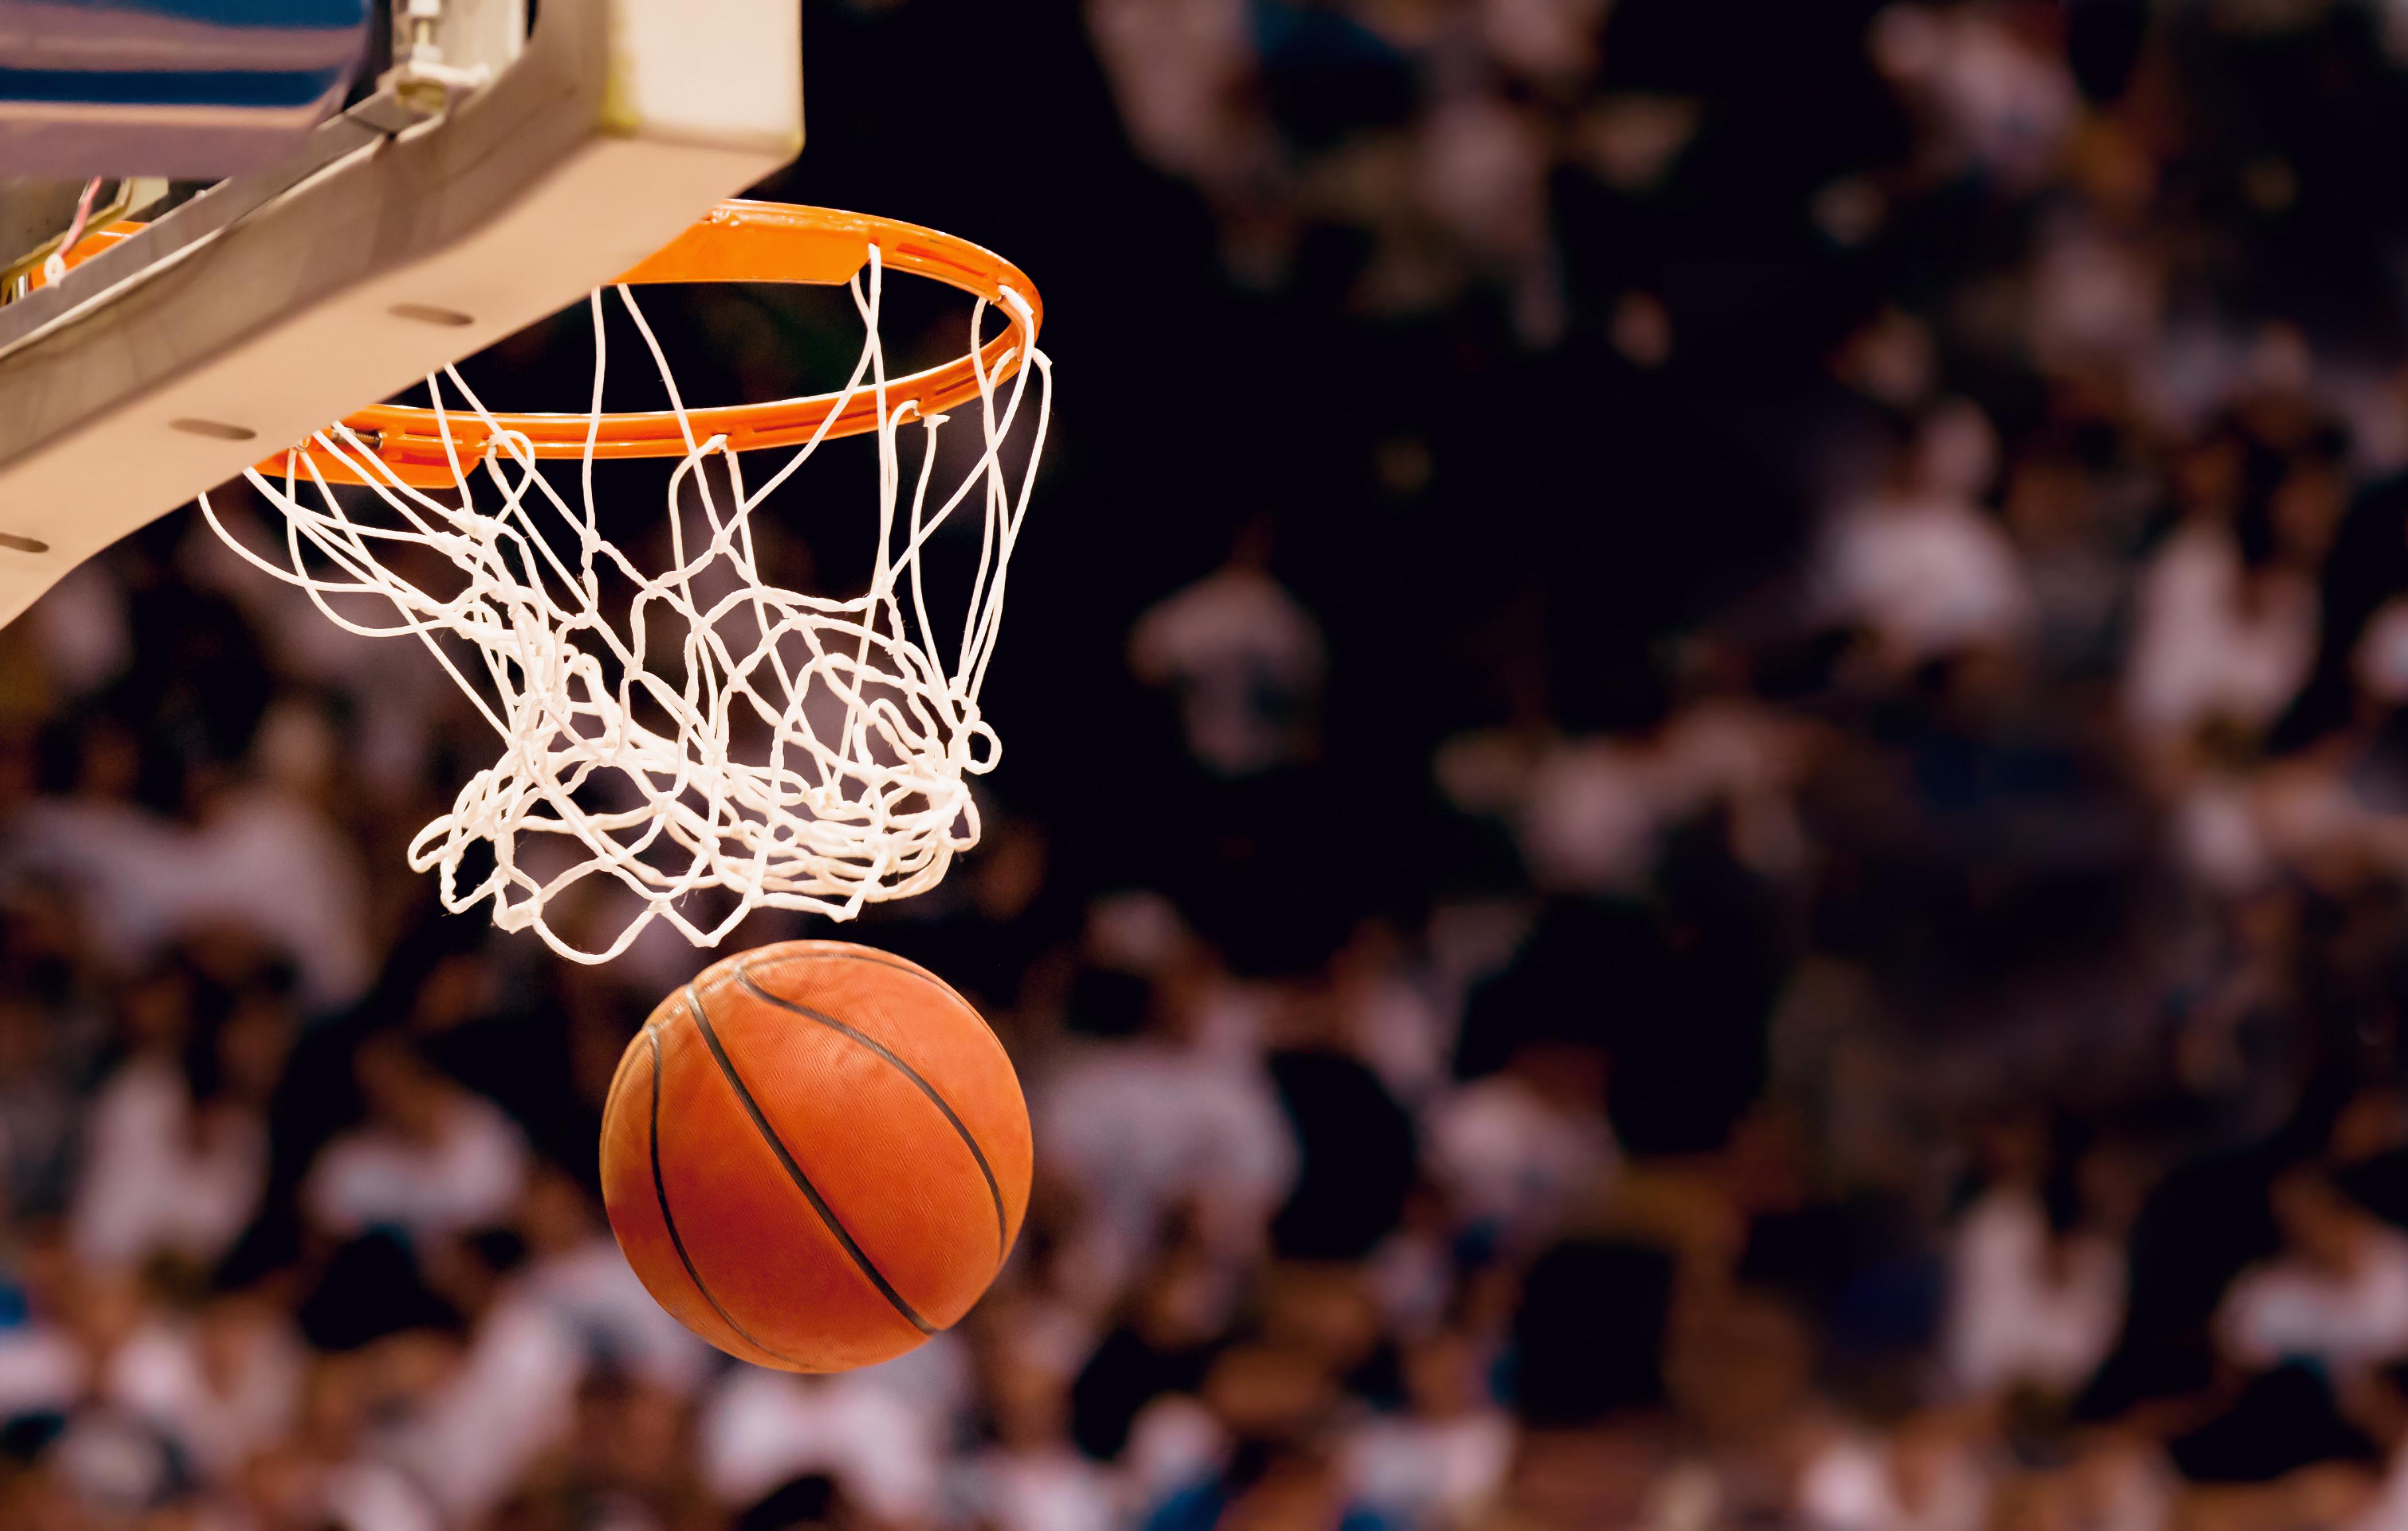 stock image of a basketball going through a hoop